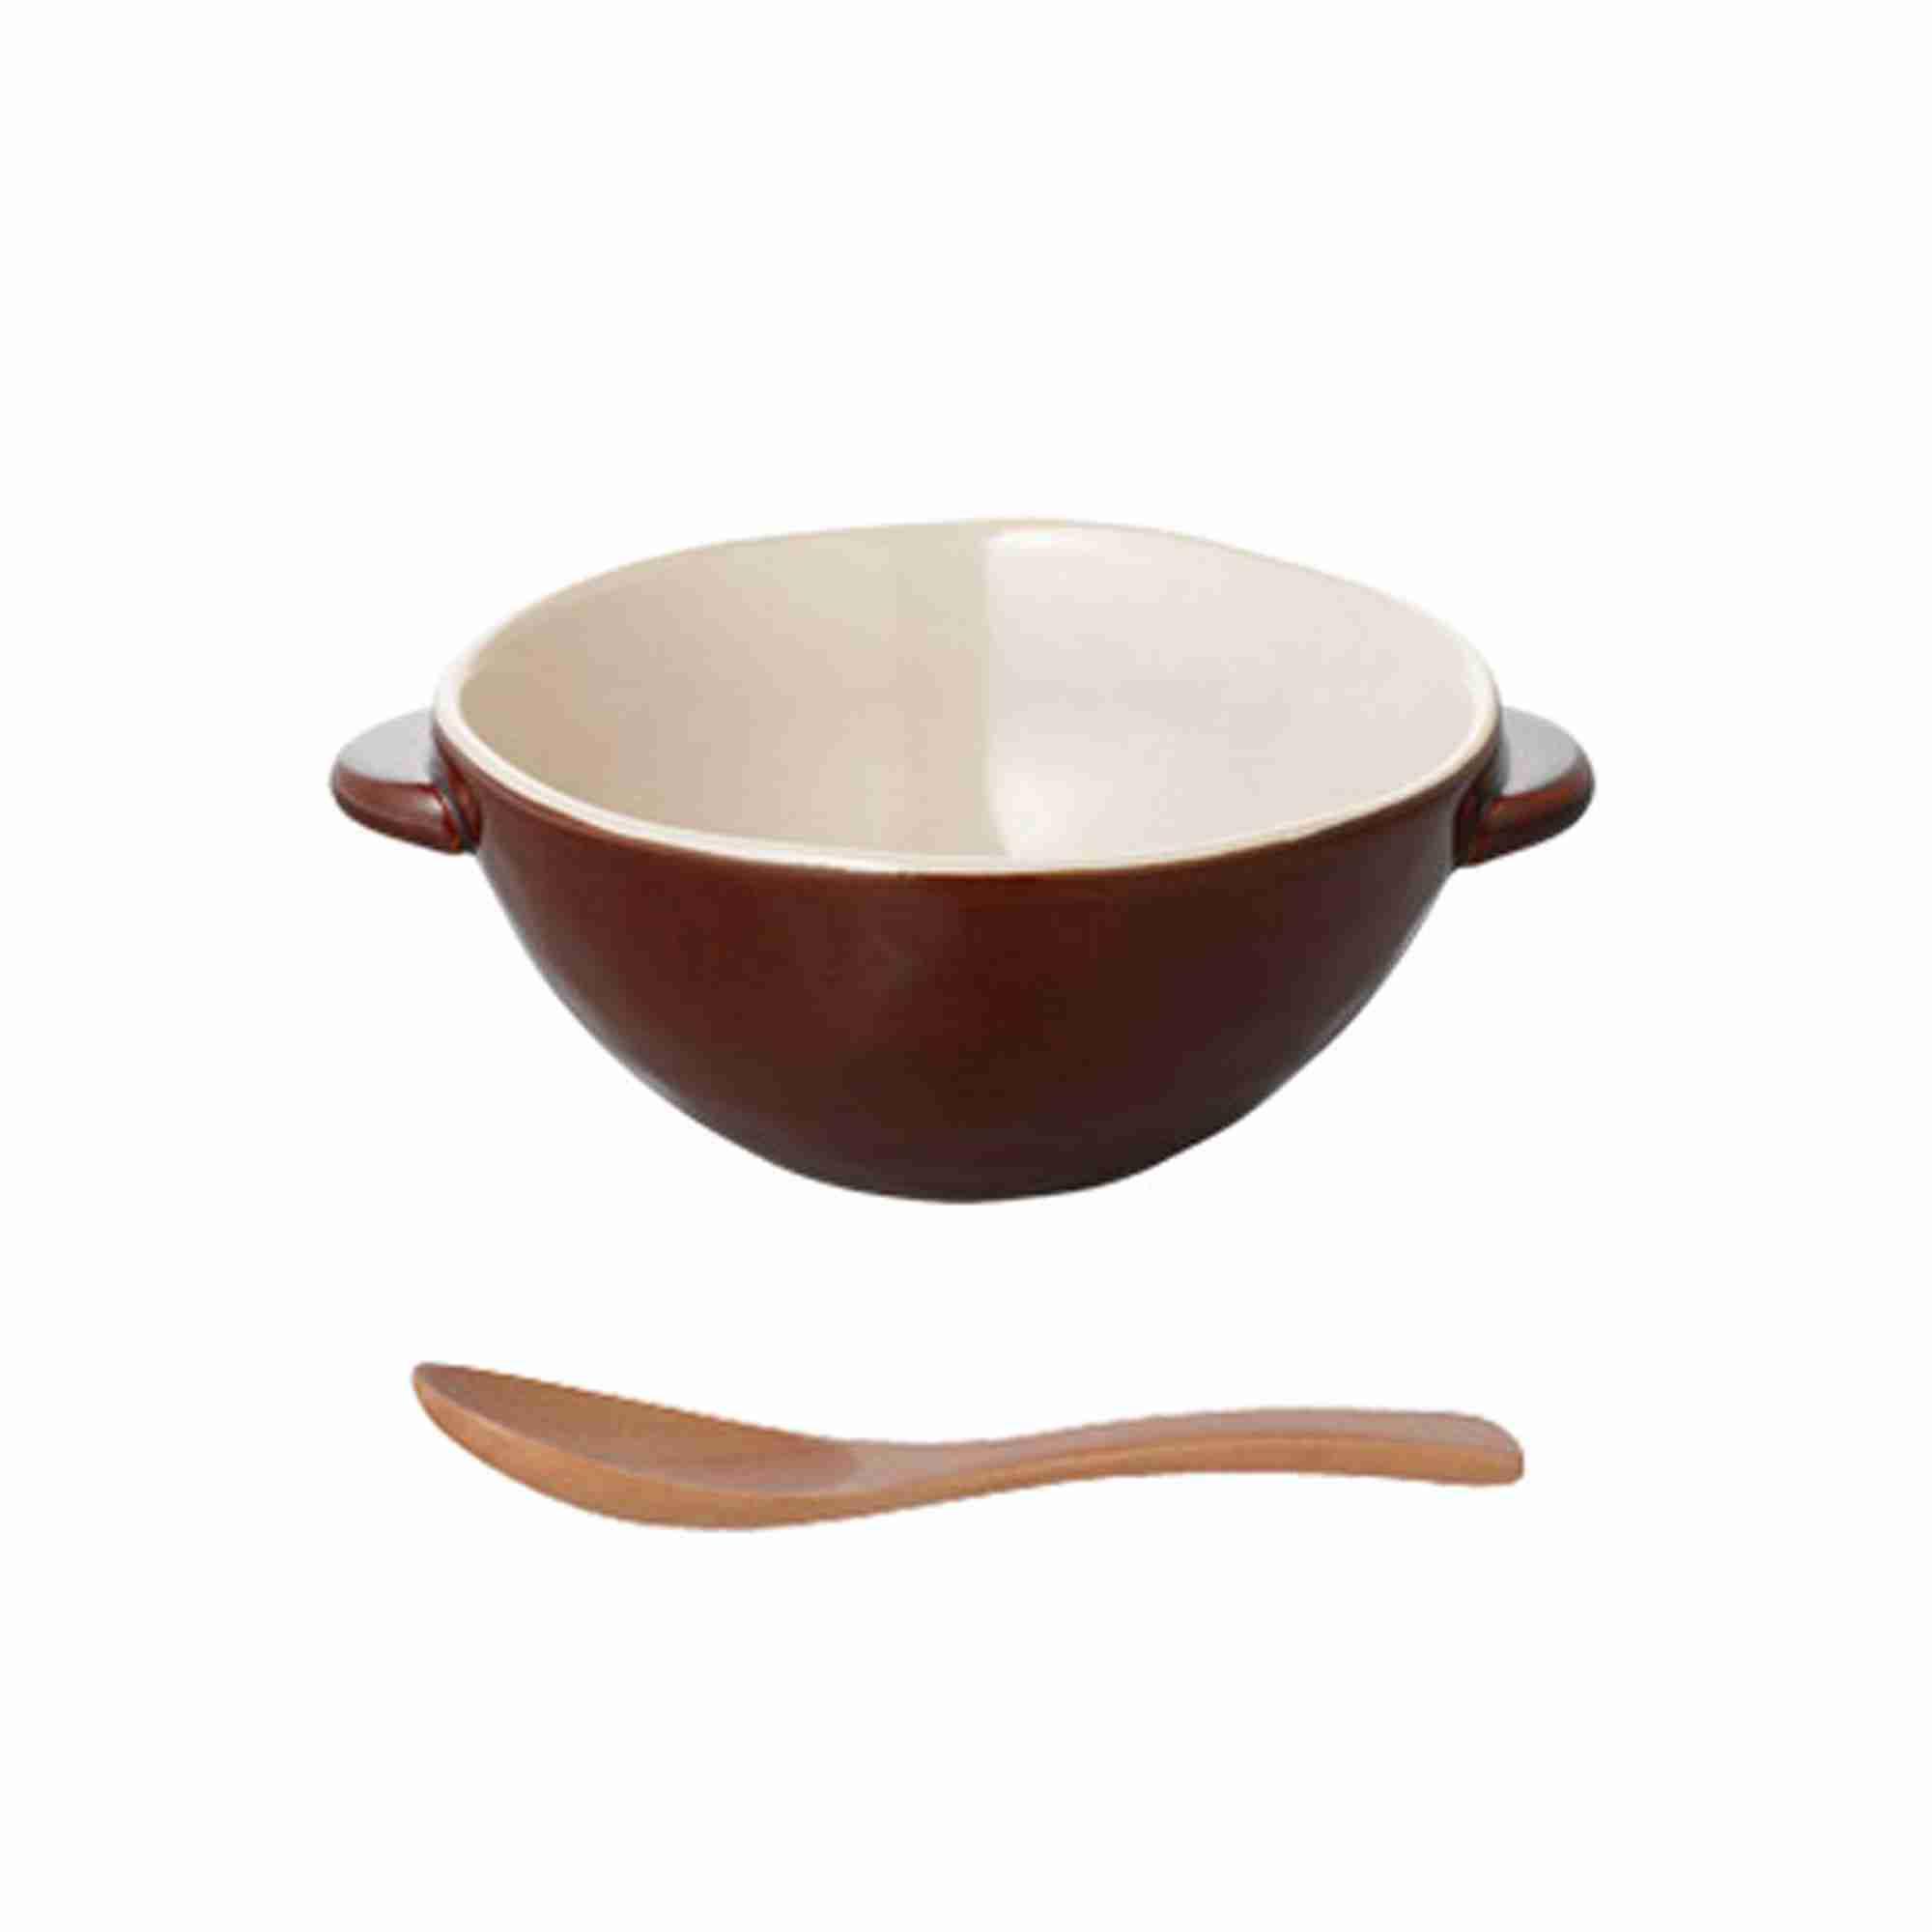 Hokkuri Handmade Bowl with Spoon Set in Brown